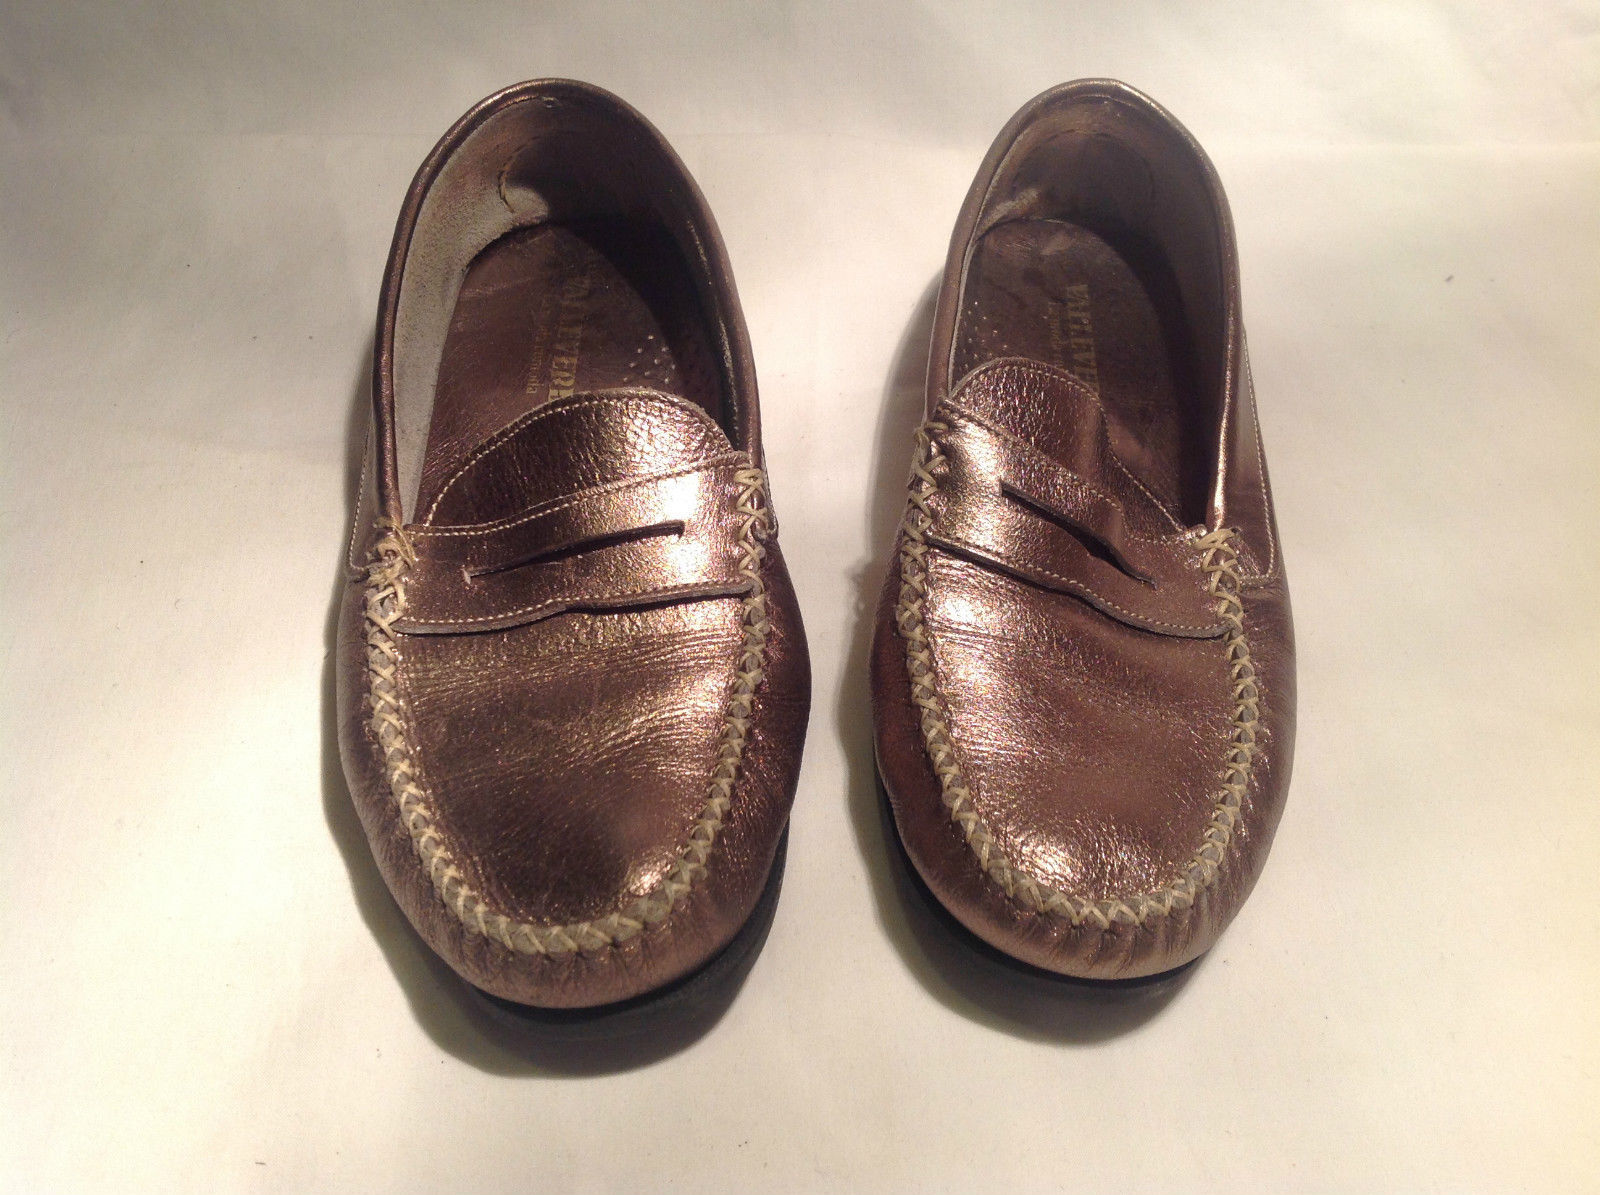 Valleverde Metallic Gold Colored Loafers La Moda Comoda Made in Italy Size 38 EU